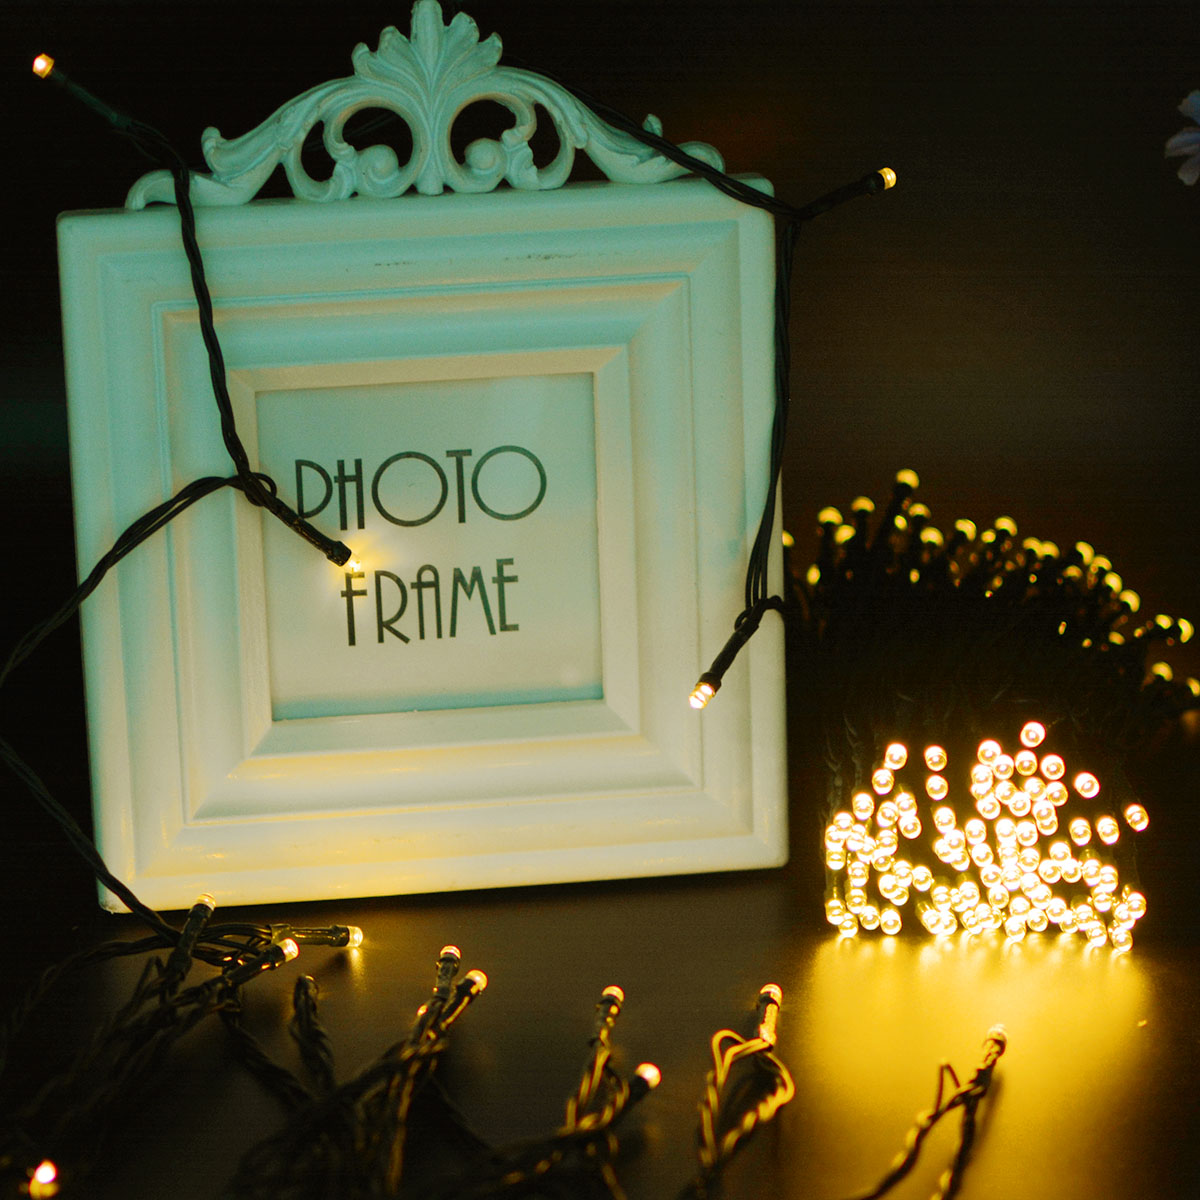 Dcoo Solar LED String Lights 22meter 200 LEDs Waterproof 8 Modes Fairy Christmas Lights Outdoor Lighitng Garden Party Lights